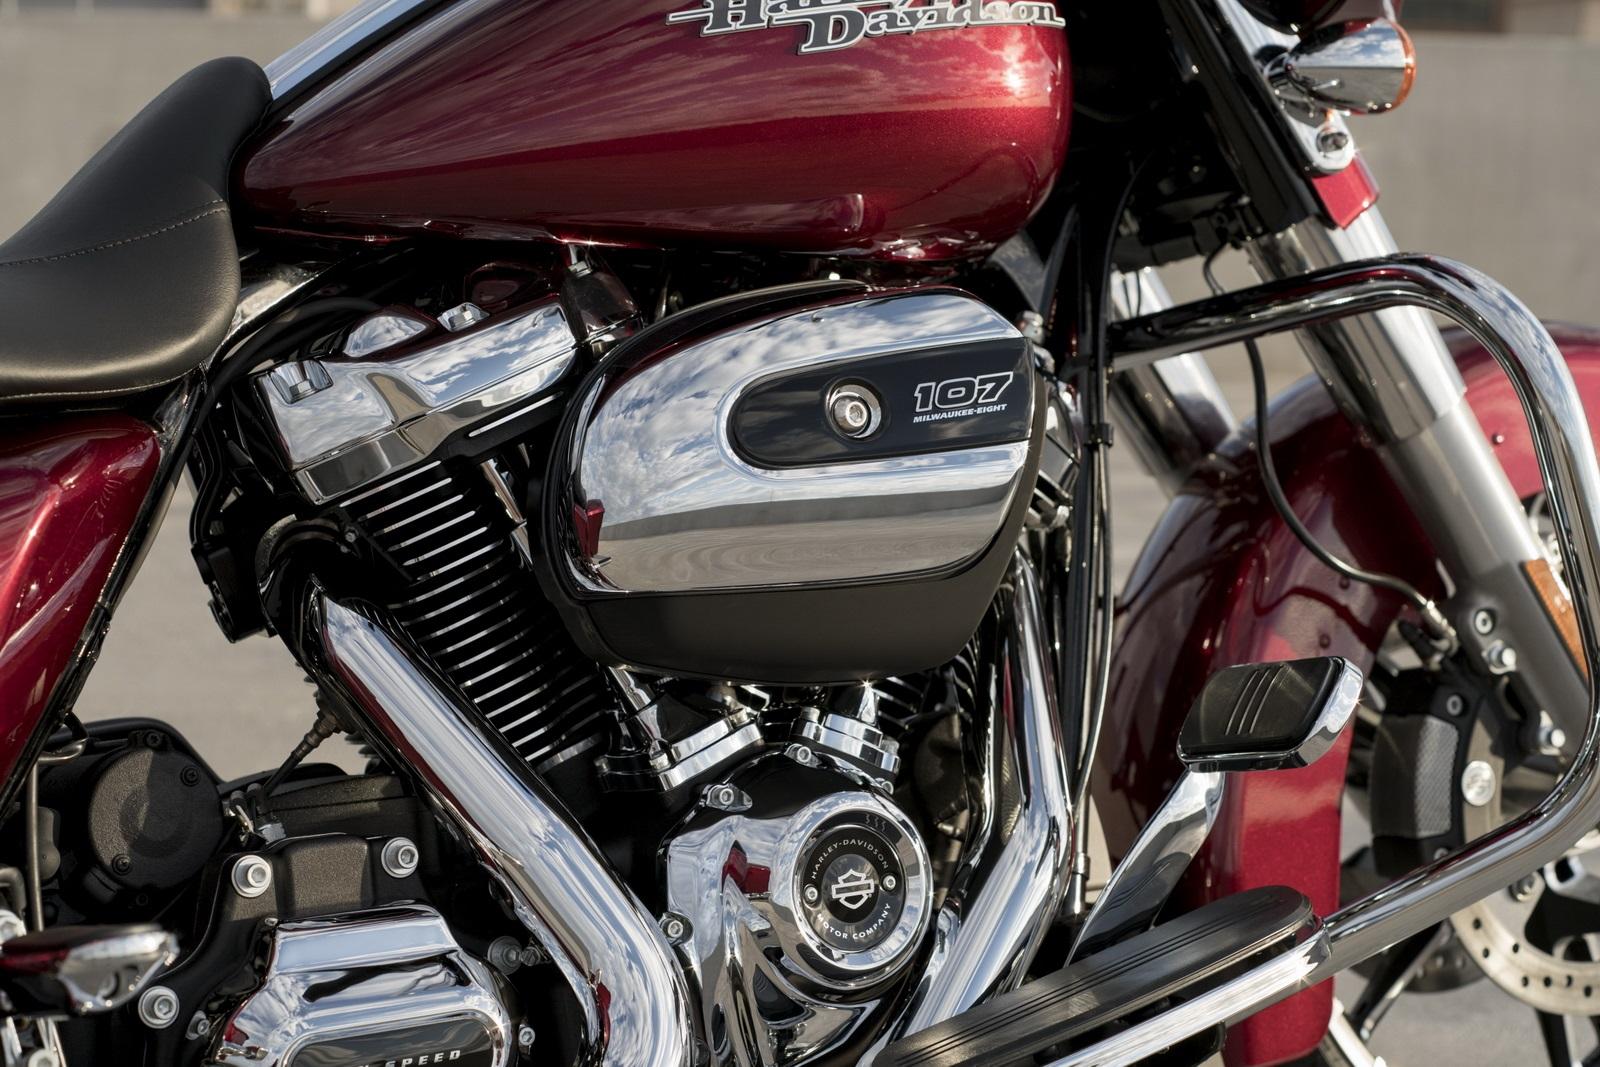 Абсолютно новый двигатель Harley-Davidson